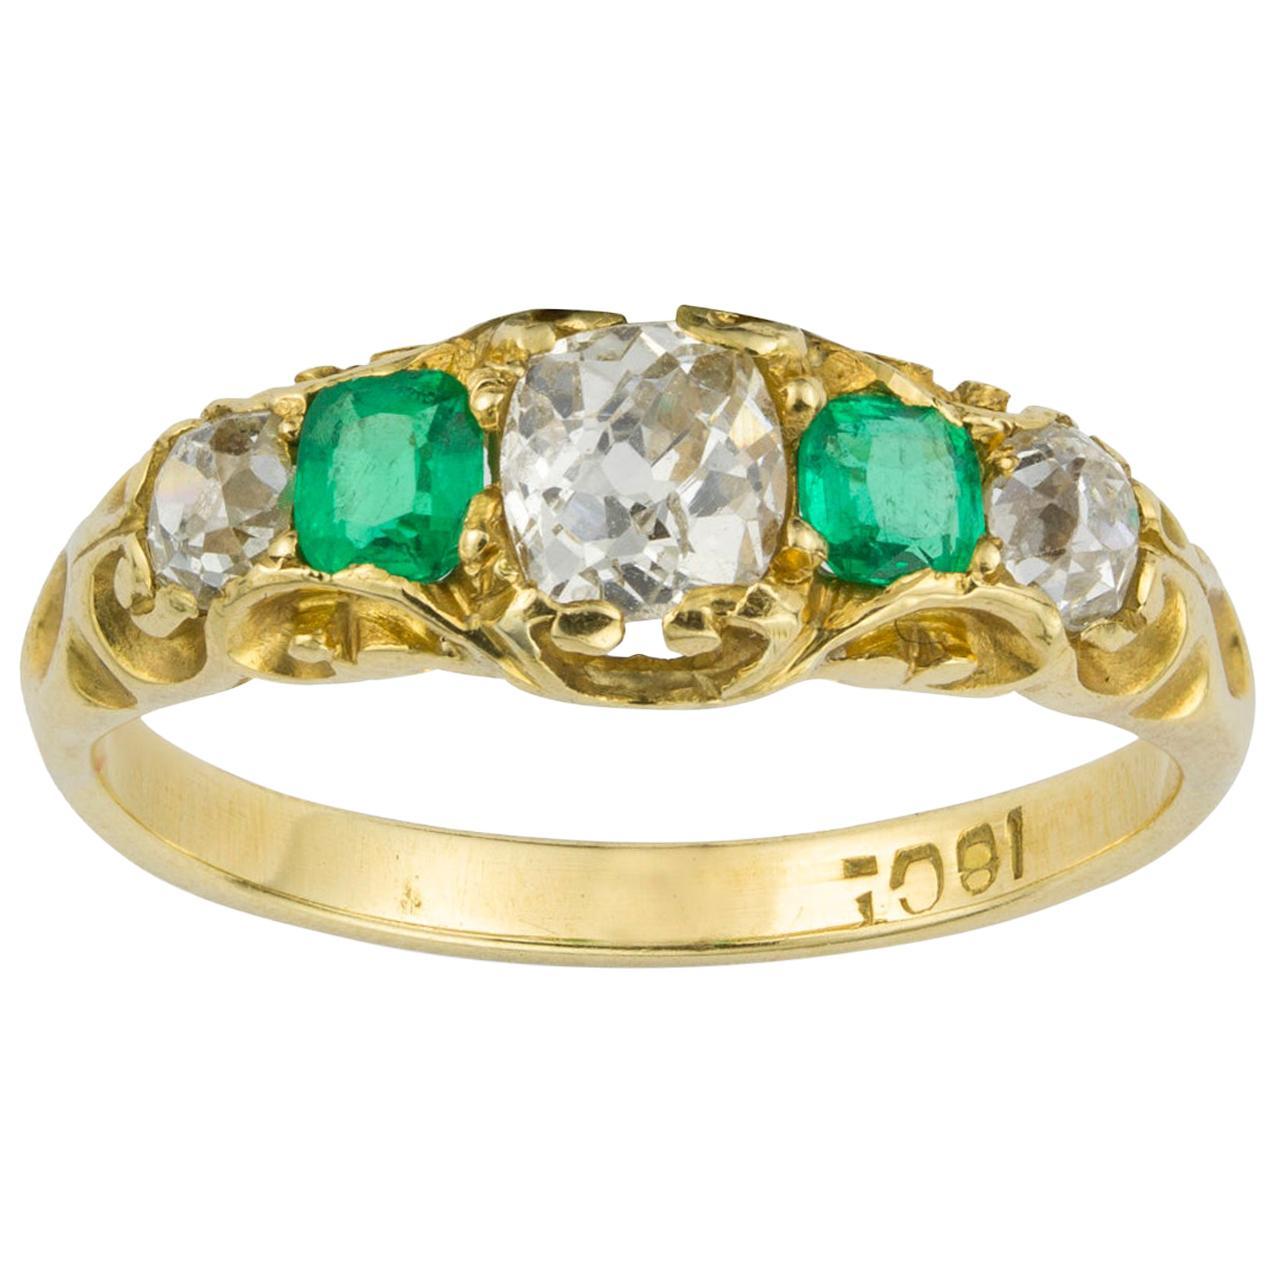 Victorian Emerald and Diamond Five-Stone Gold Ring